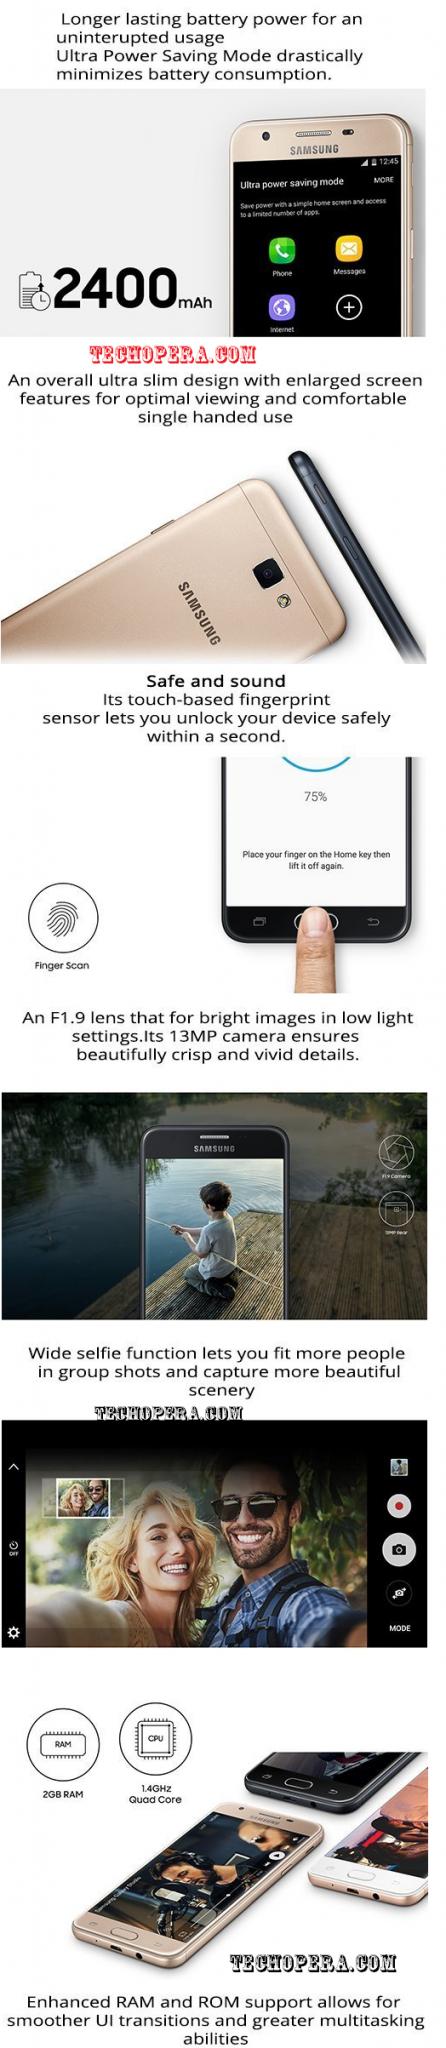 Samsung Galaxy J5 Prime Infographic